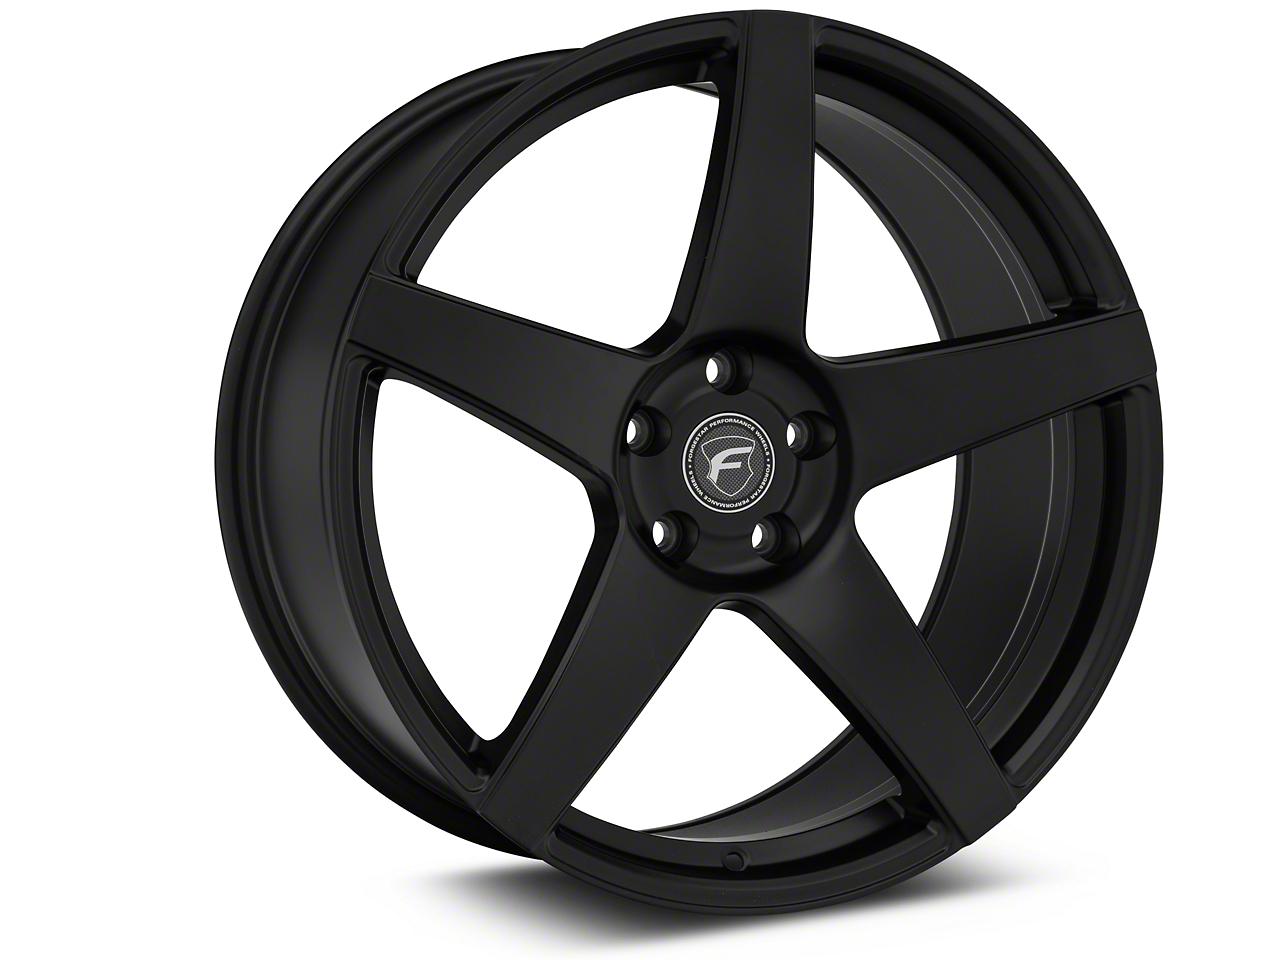 Forgestar CF5 Monoblock Matte Black Wheel - 20x9.5 (15-19 GT, EcoBoost, V6)